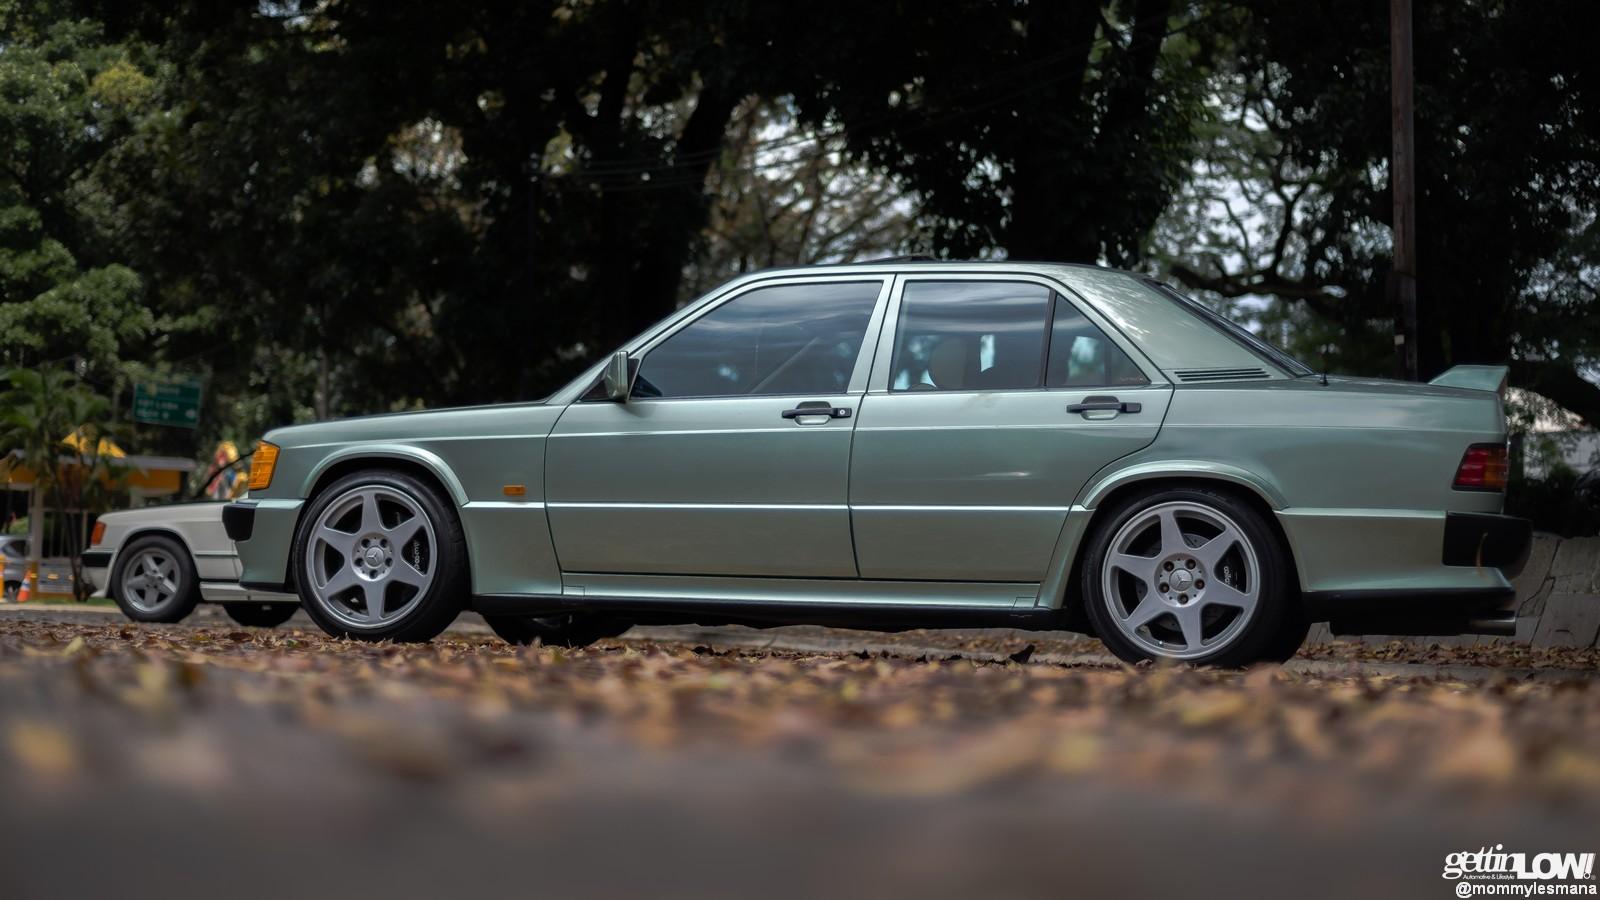 Mercedes Benz W201 Tosca